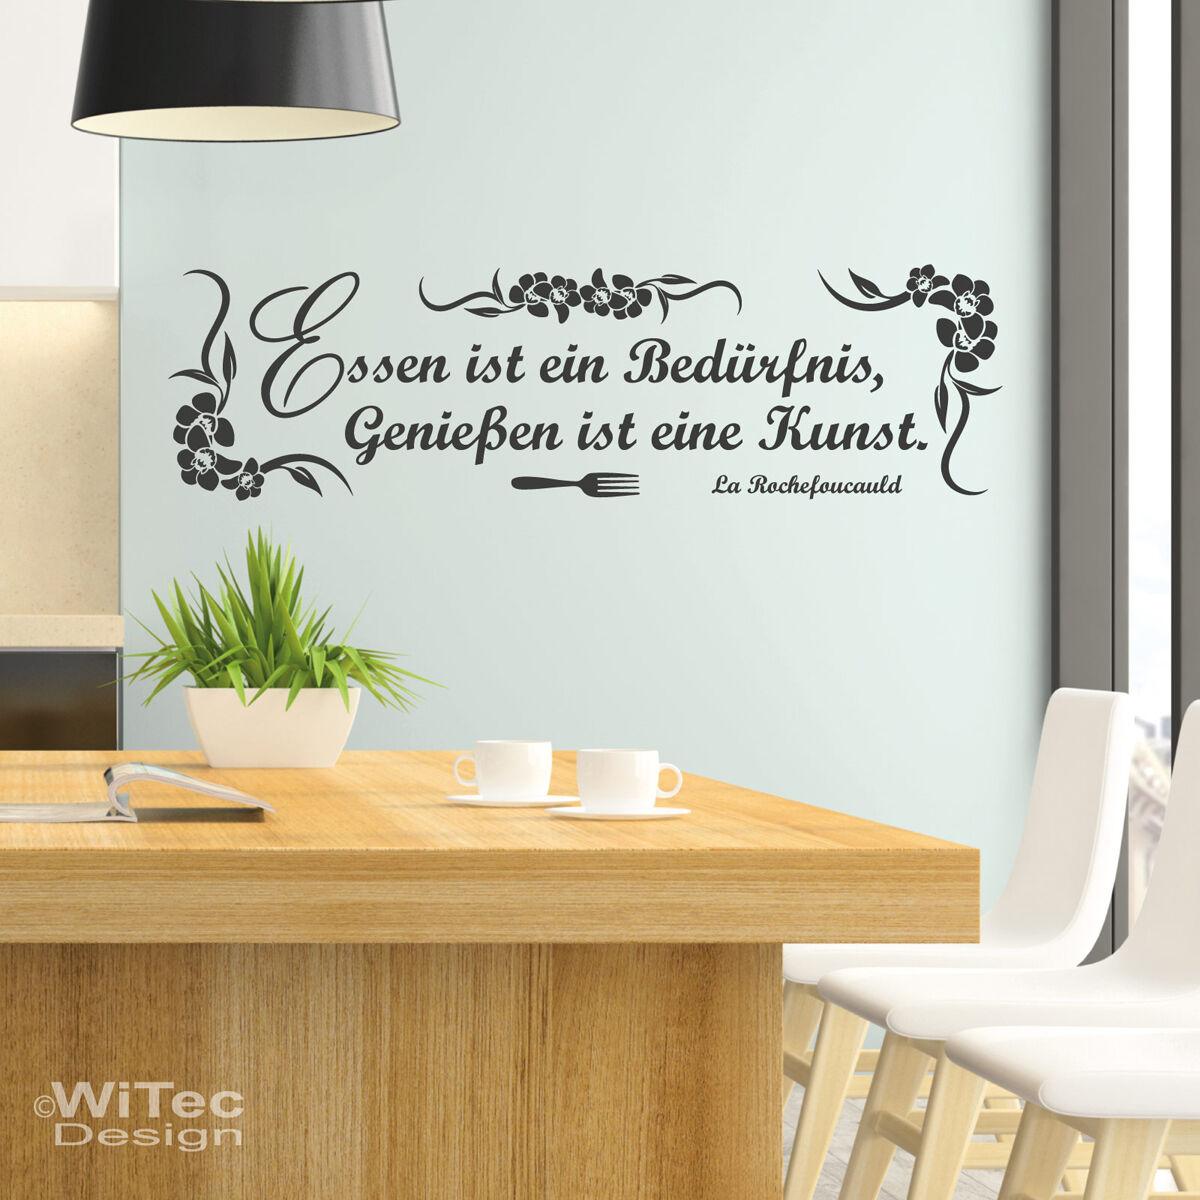 Emejing Lustige Sprüche Küche Ideas - Milbank.us - milbank.us